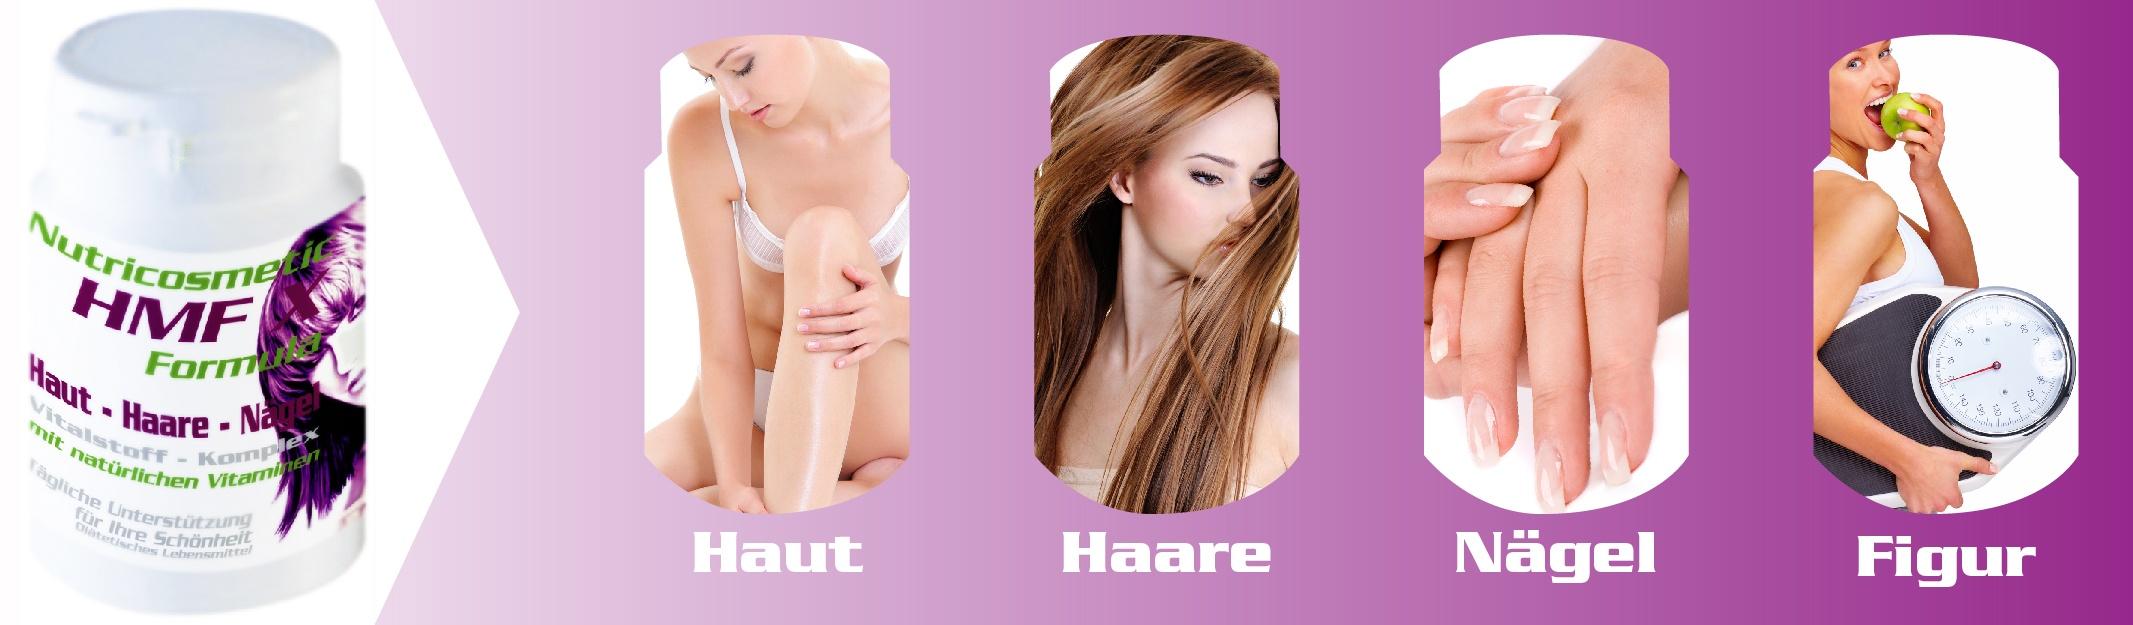 Unterstuetzung Hau - Haare - Naegel